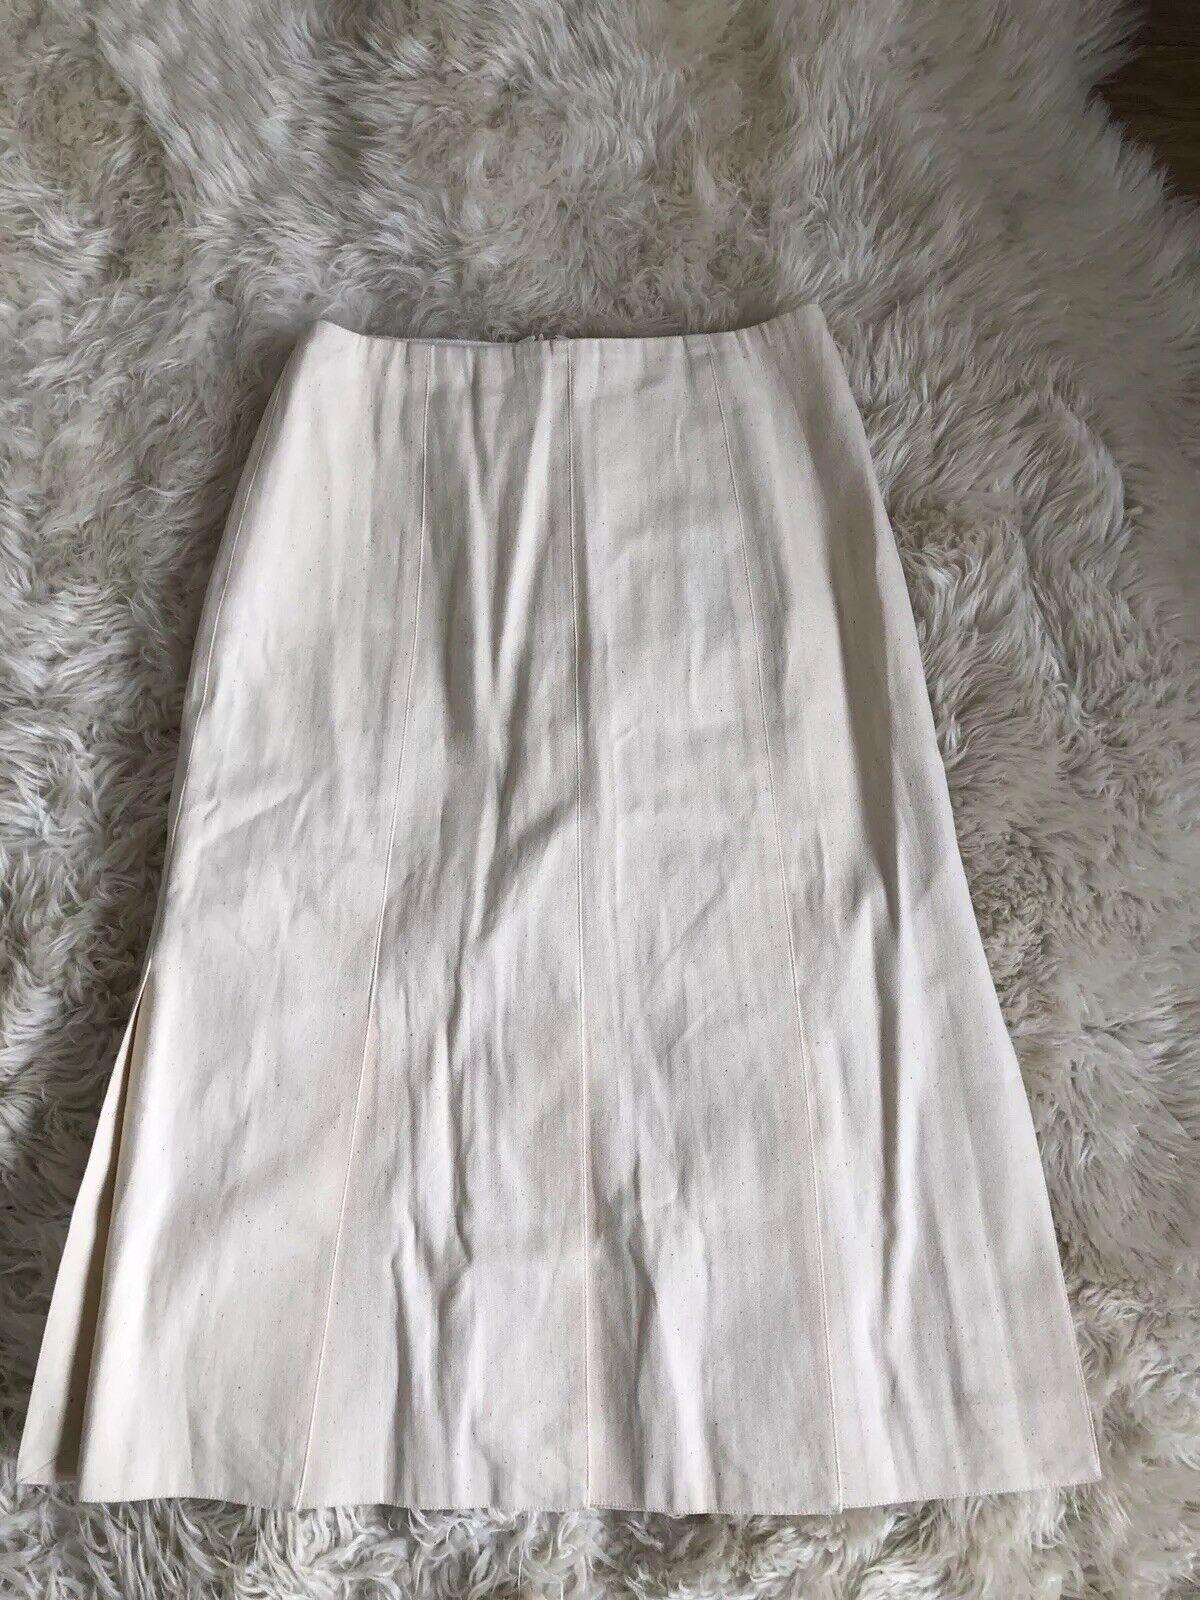 New Jcrew Collection car wash denim skirt in ecru Size 2 F2620 Ivory